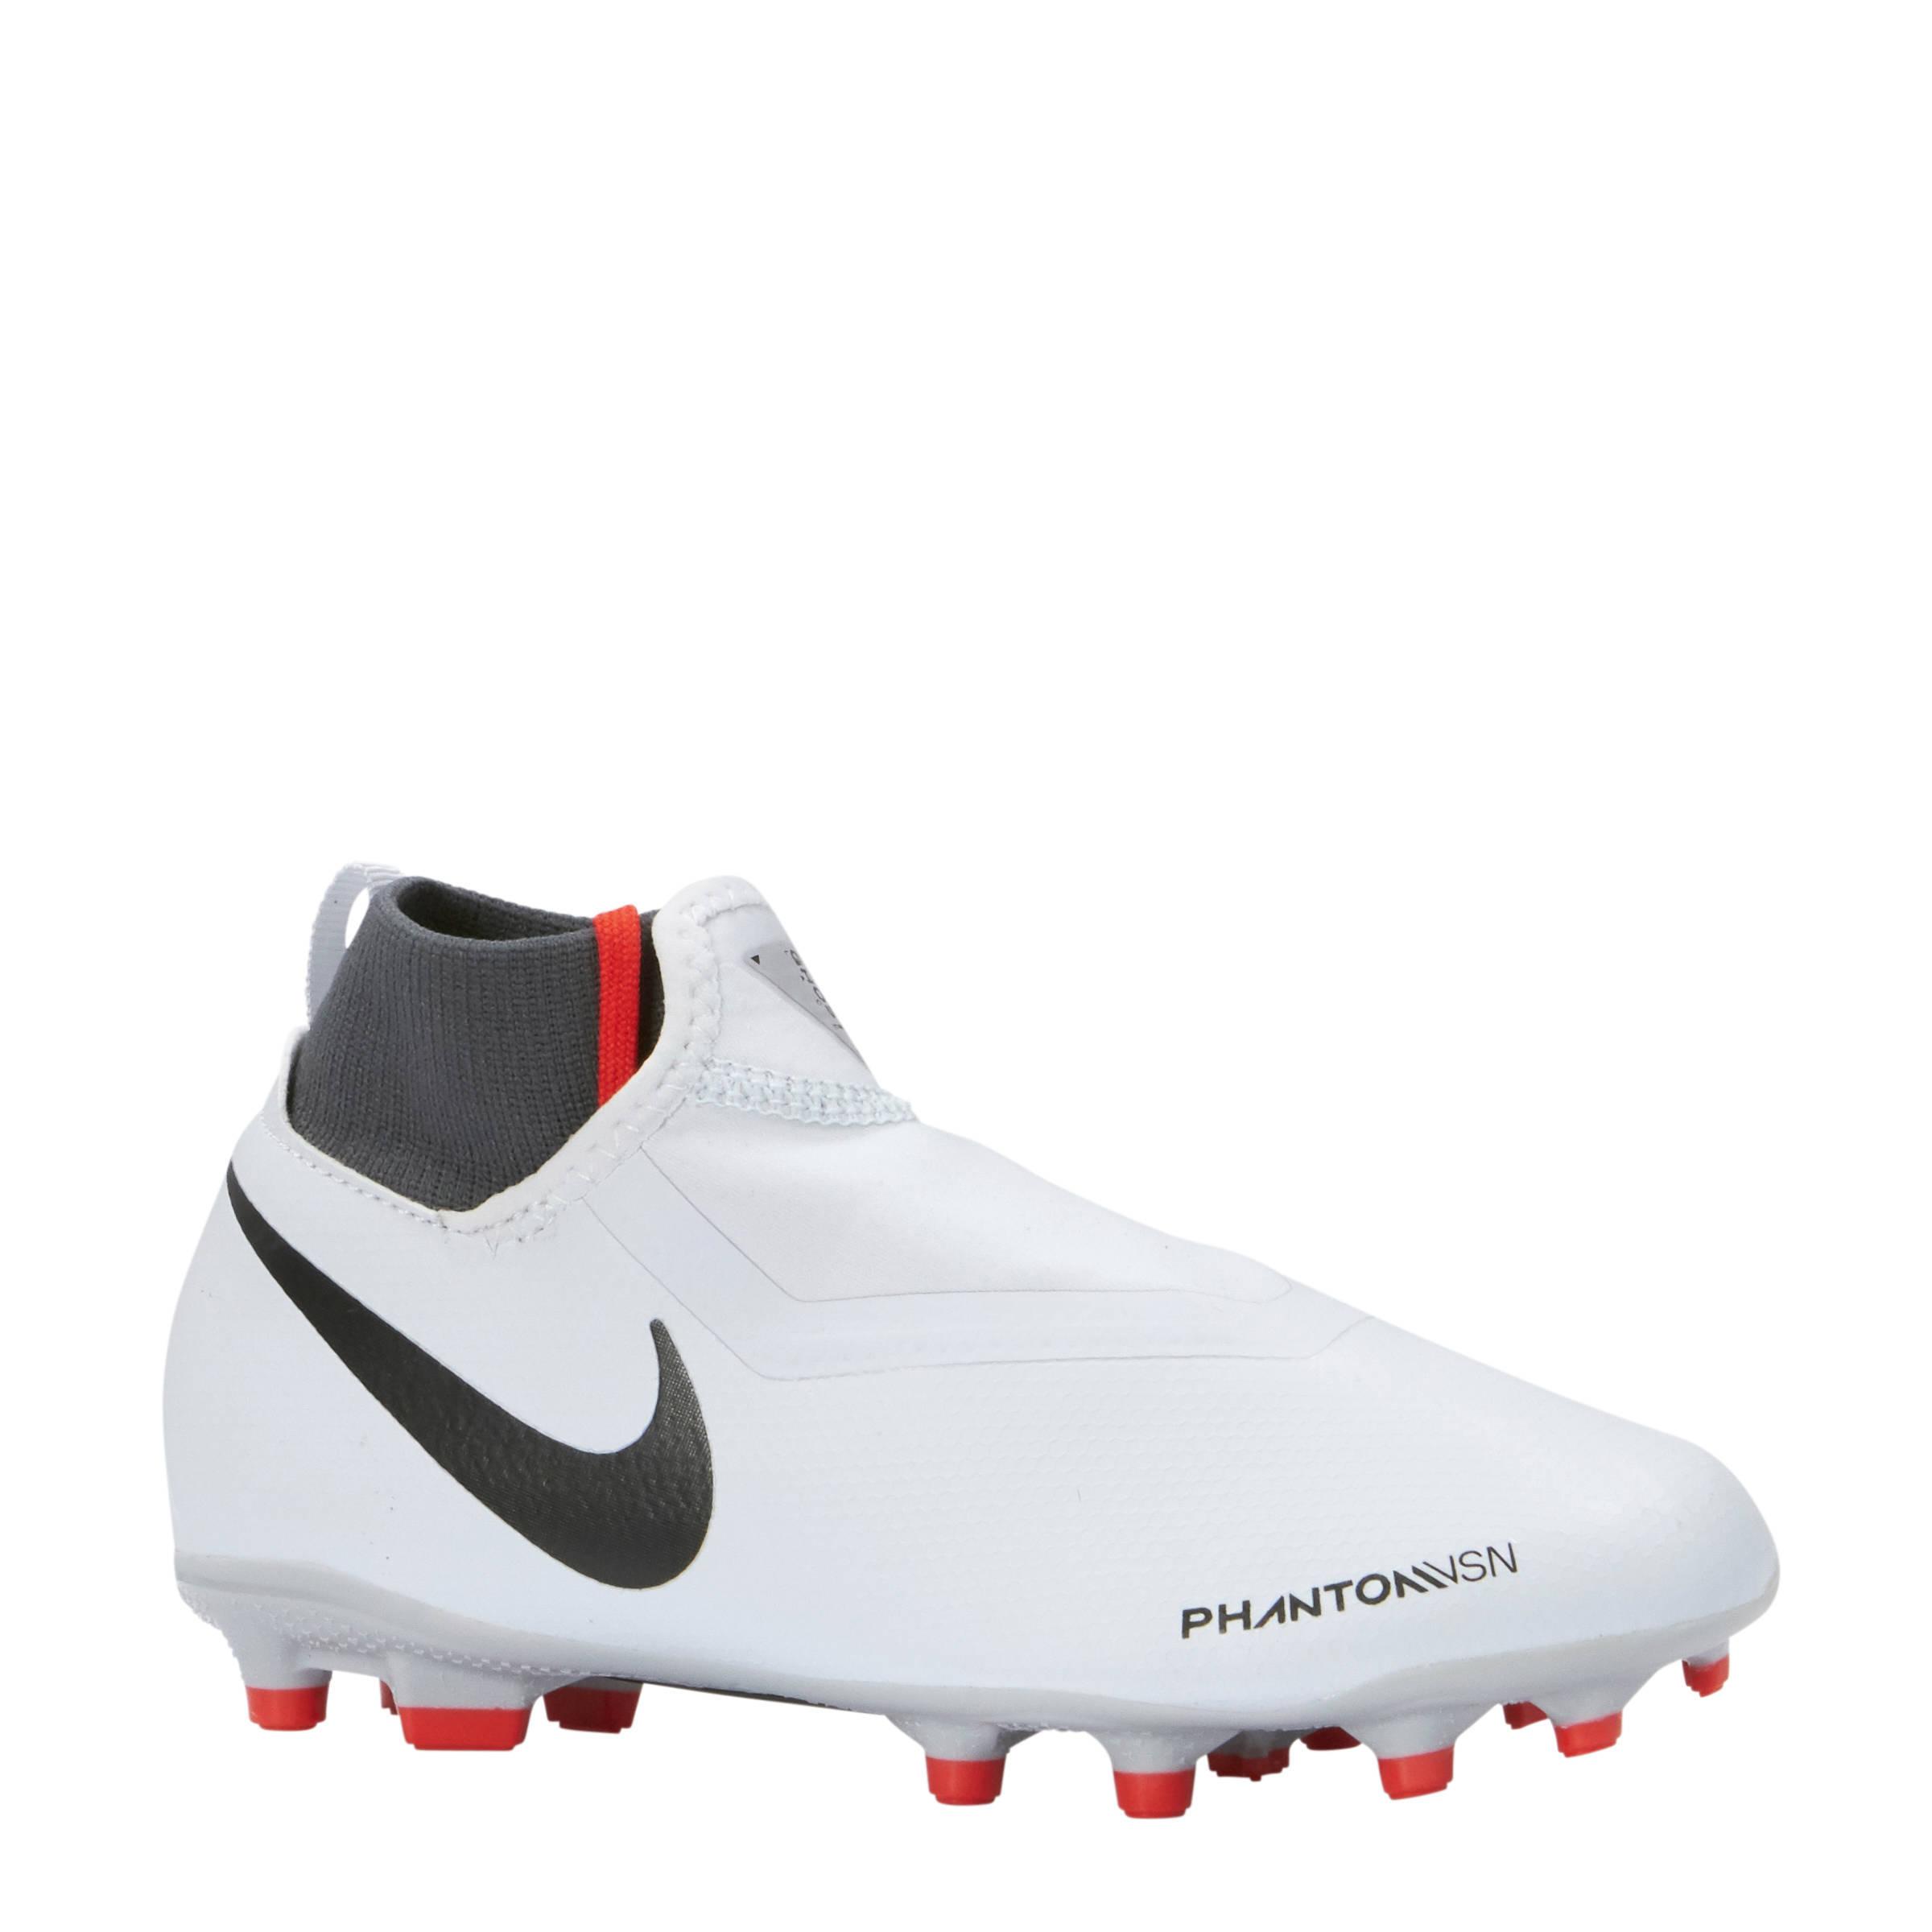 separation shoes aadf7 c092a Nike Jr. Phantom Vision Academy DF MG voetbalschoenen lichtgrijs | wehkamp